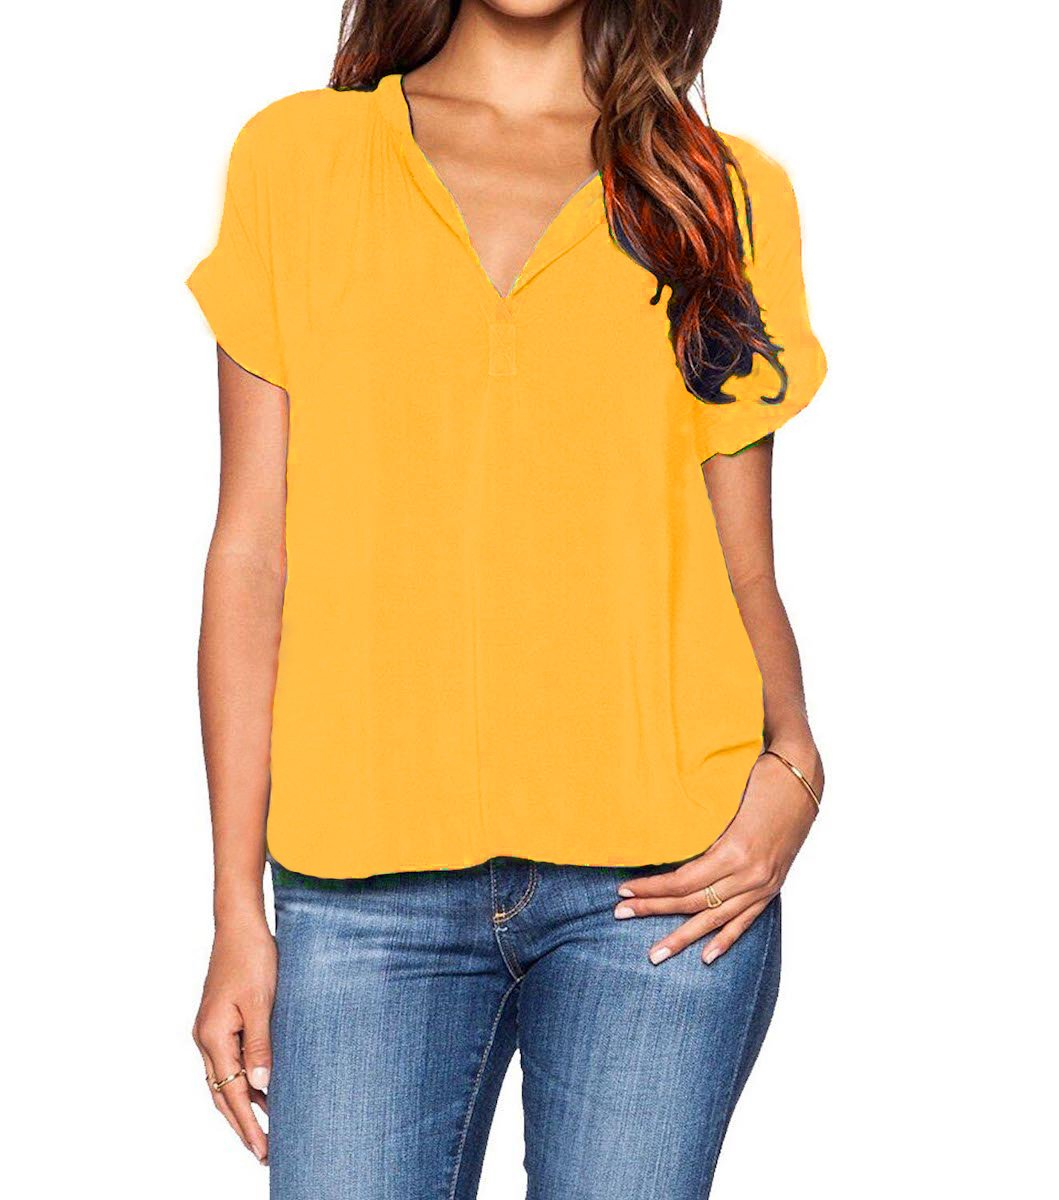 Grace Elbe Women's Chiffon Blouse V Neck Short Sleeve Top Shirts Mustard XX-Large